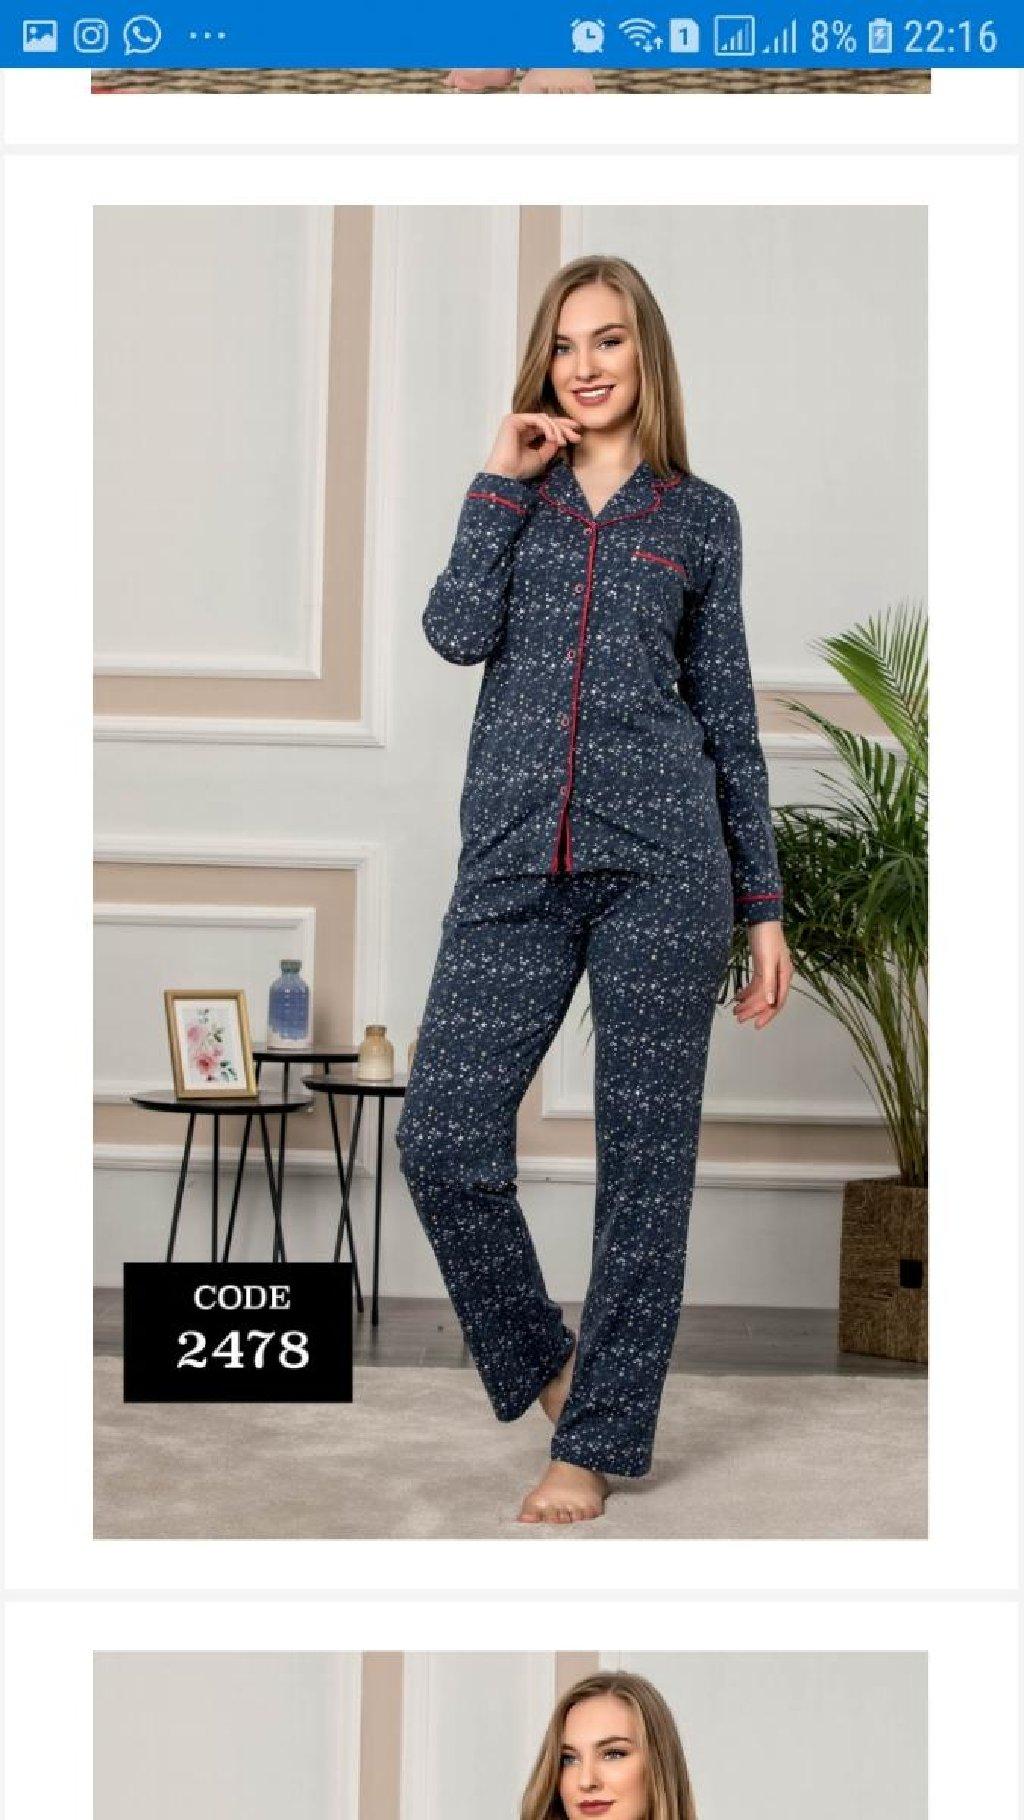 Pijama turkiyenin 100% pambiq 35 azn.Razmerler var